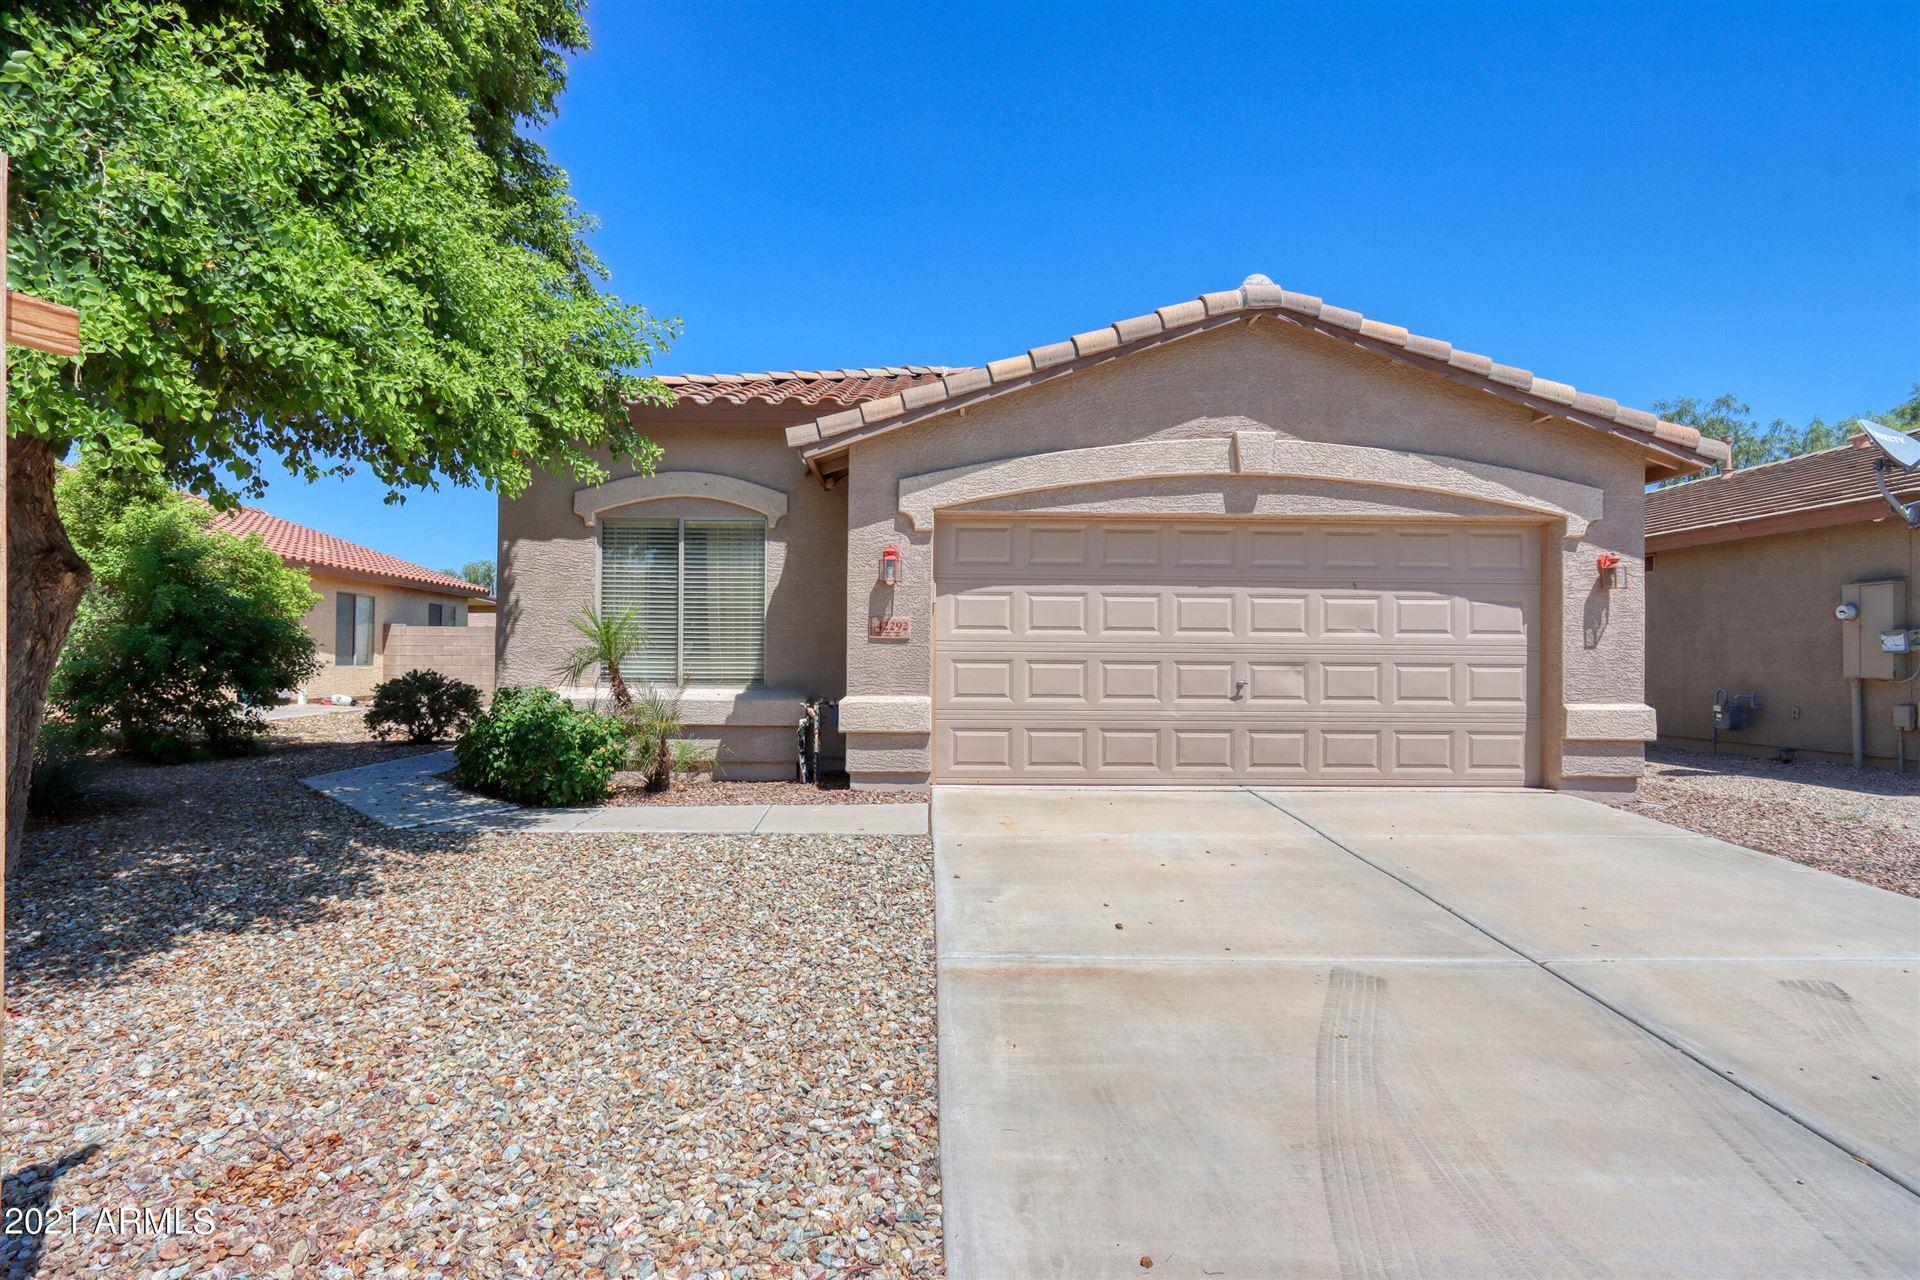 Photo for 42292 W VENTURE Road, Maricopa, AZ 85138 (MLS # 6285145)